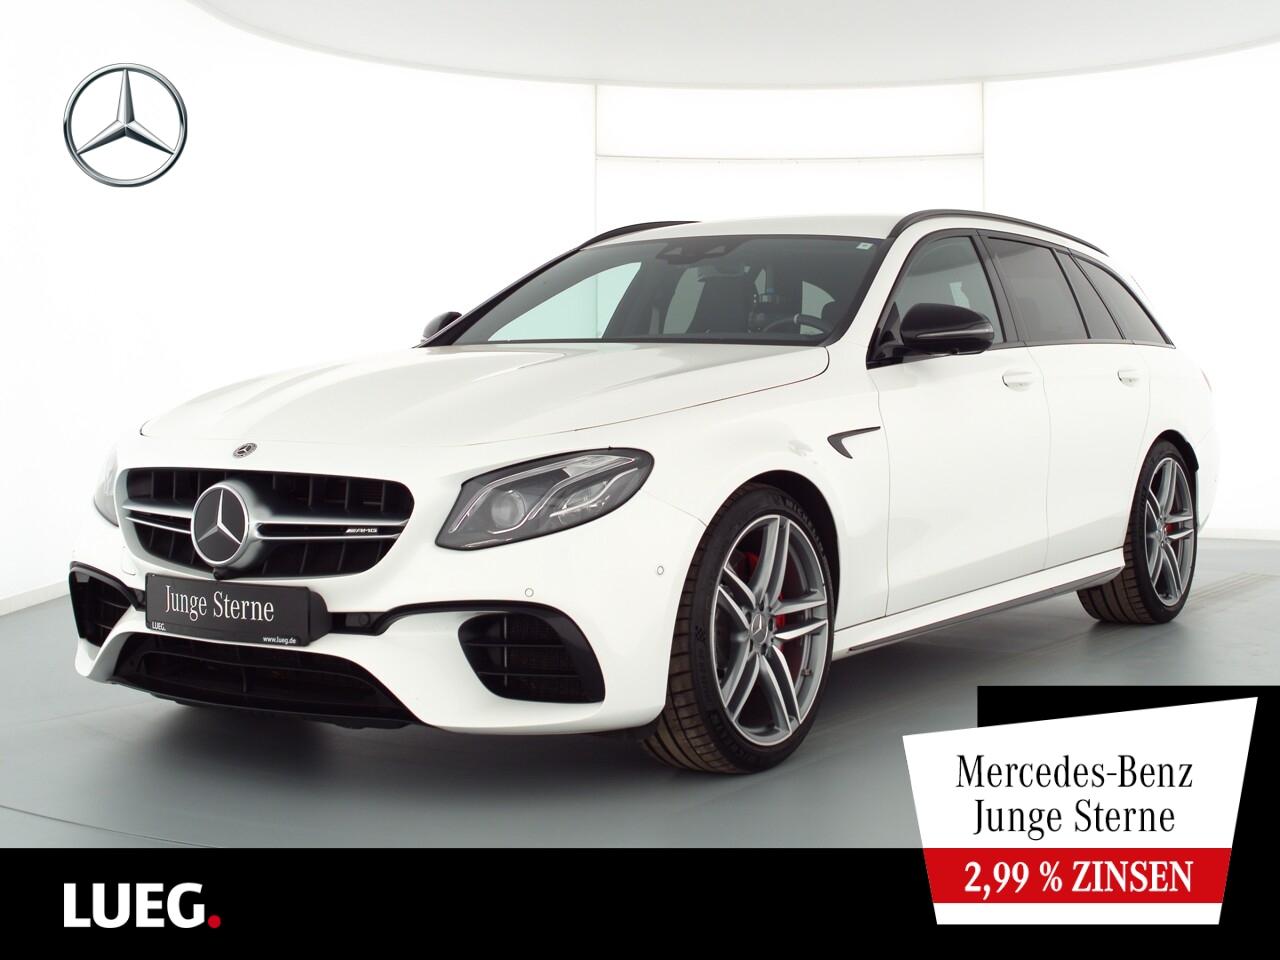 Mercedes-Benz E 63 S AMG T 4M COM+Mbeam+Sthzg+PerfS+DistrP+360, Jahr 2018, Benzin